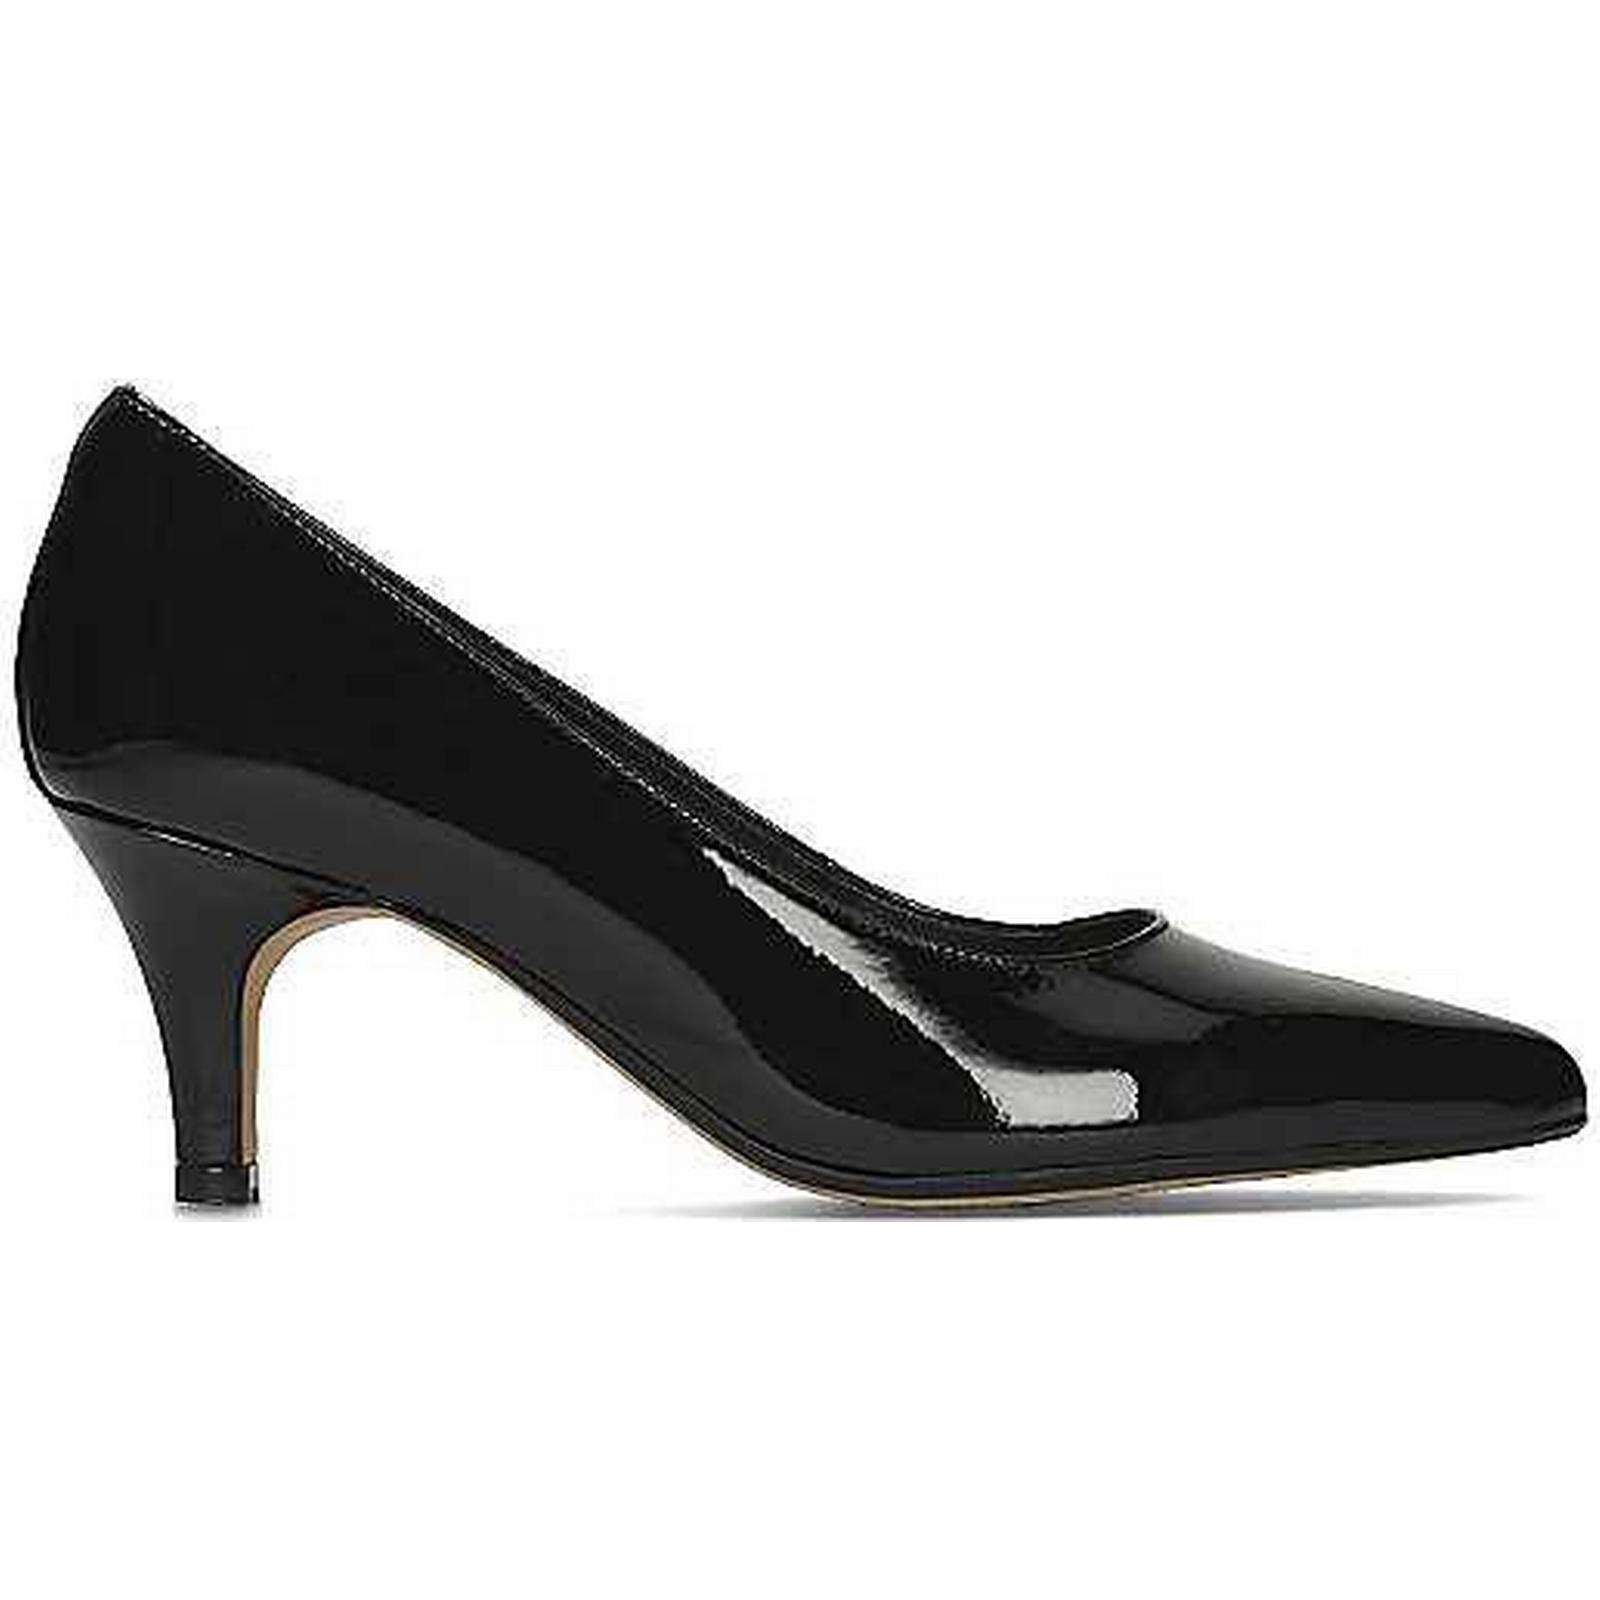 Clarks Heel Kitten Heel Clarks Court Shoes by Clarks 7fe72b